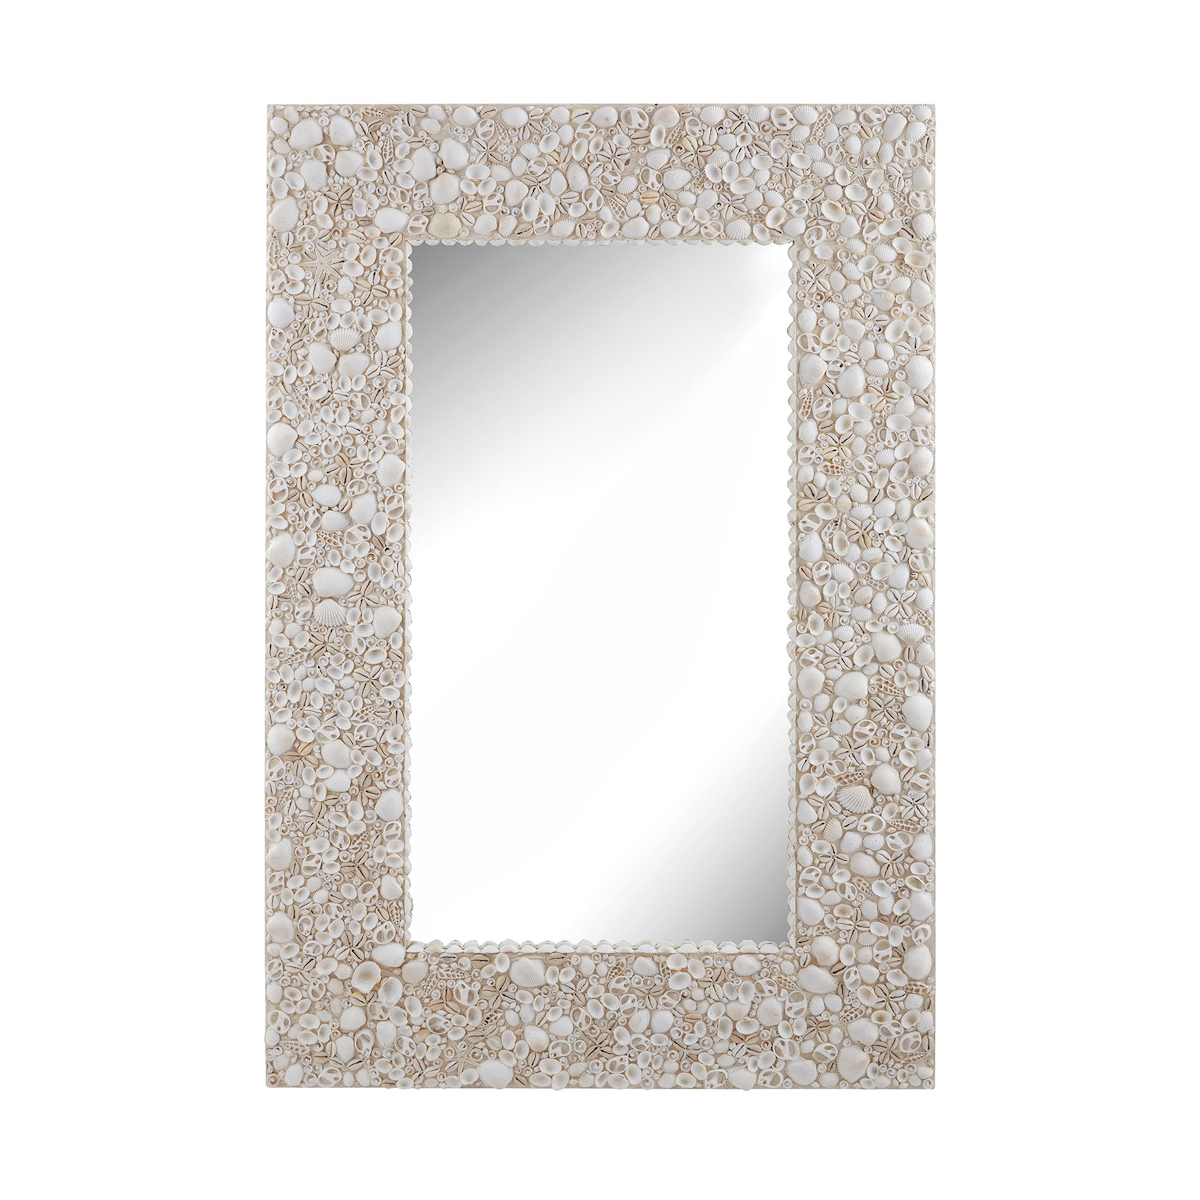 Shell Wall Mirror | Elk Home